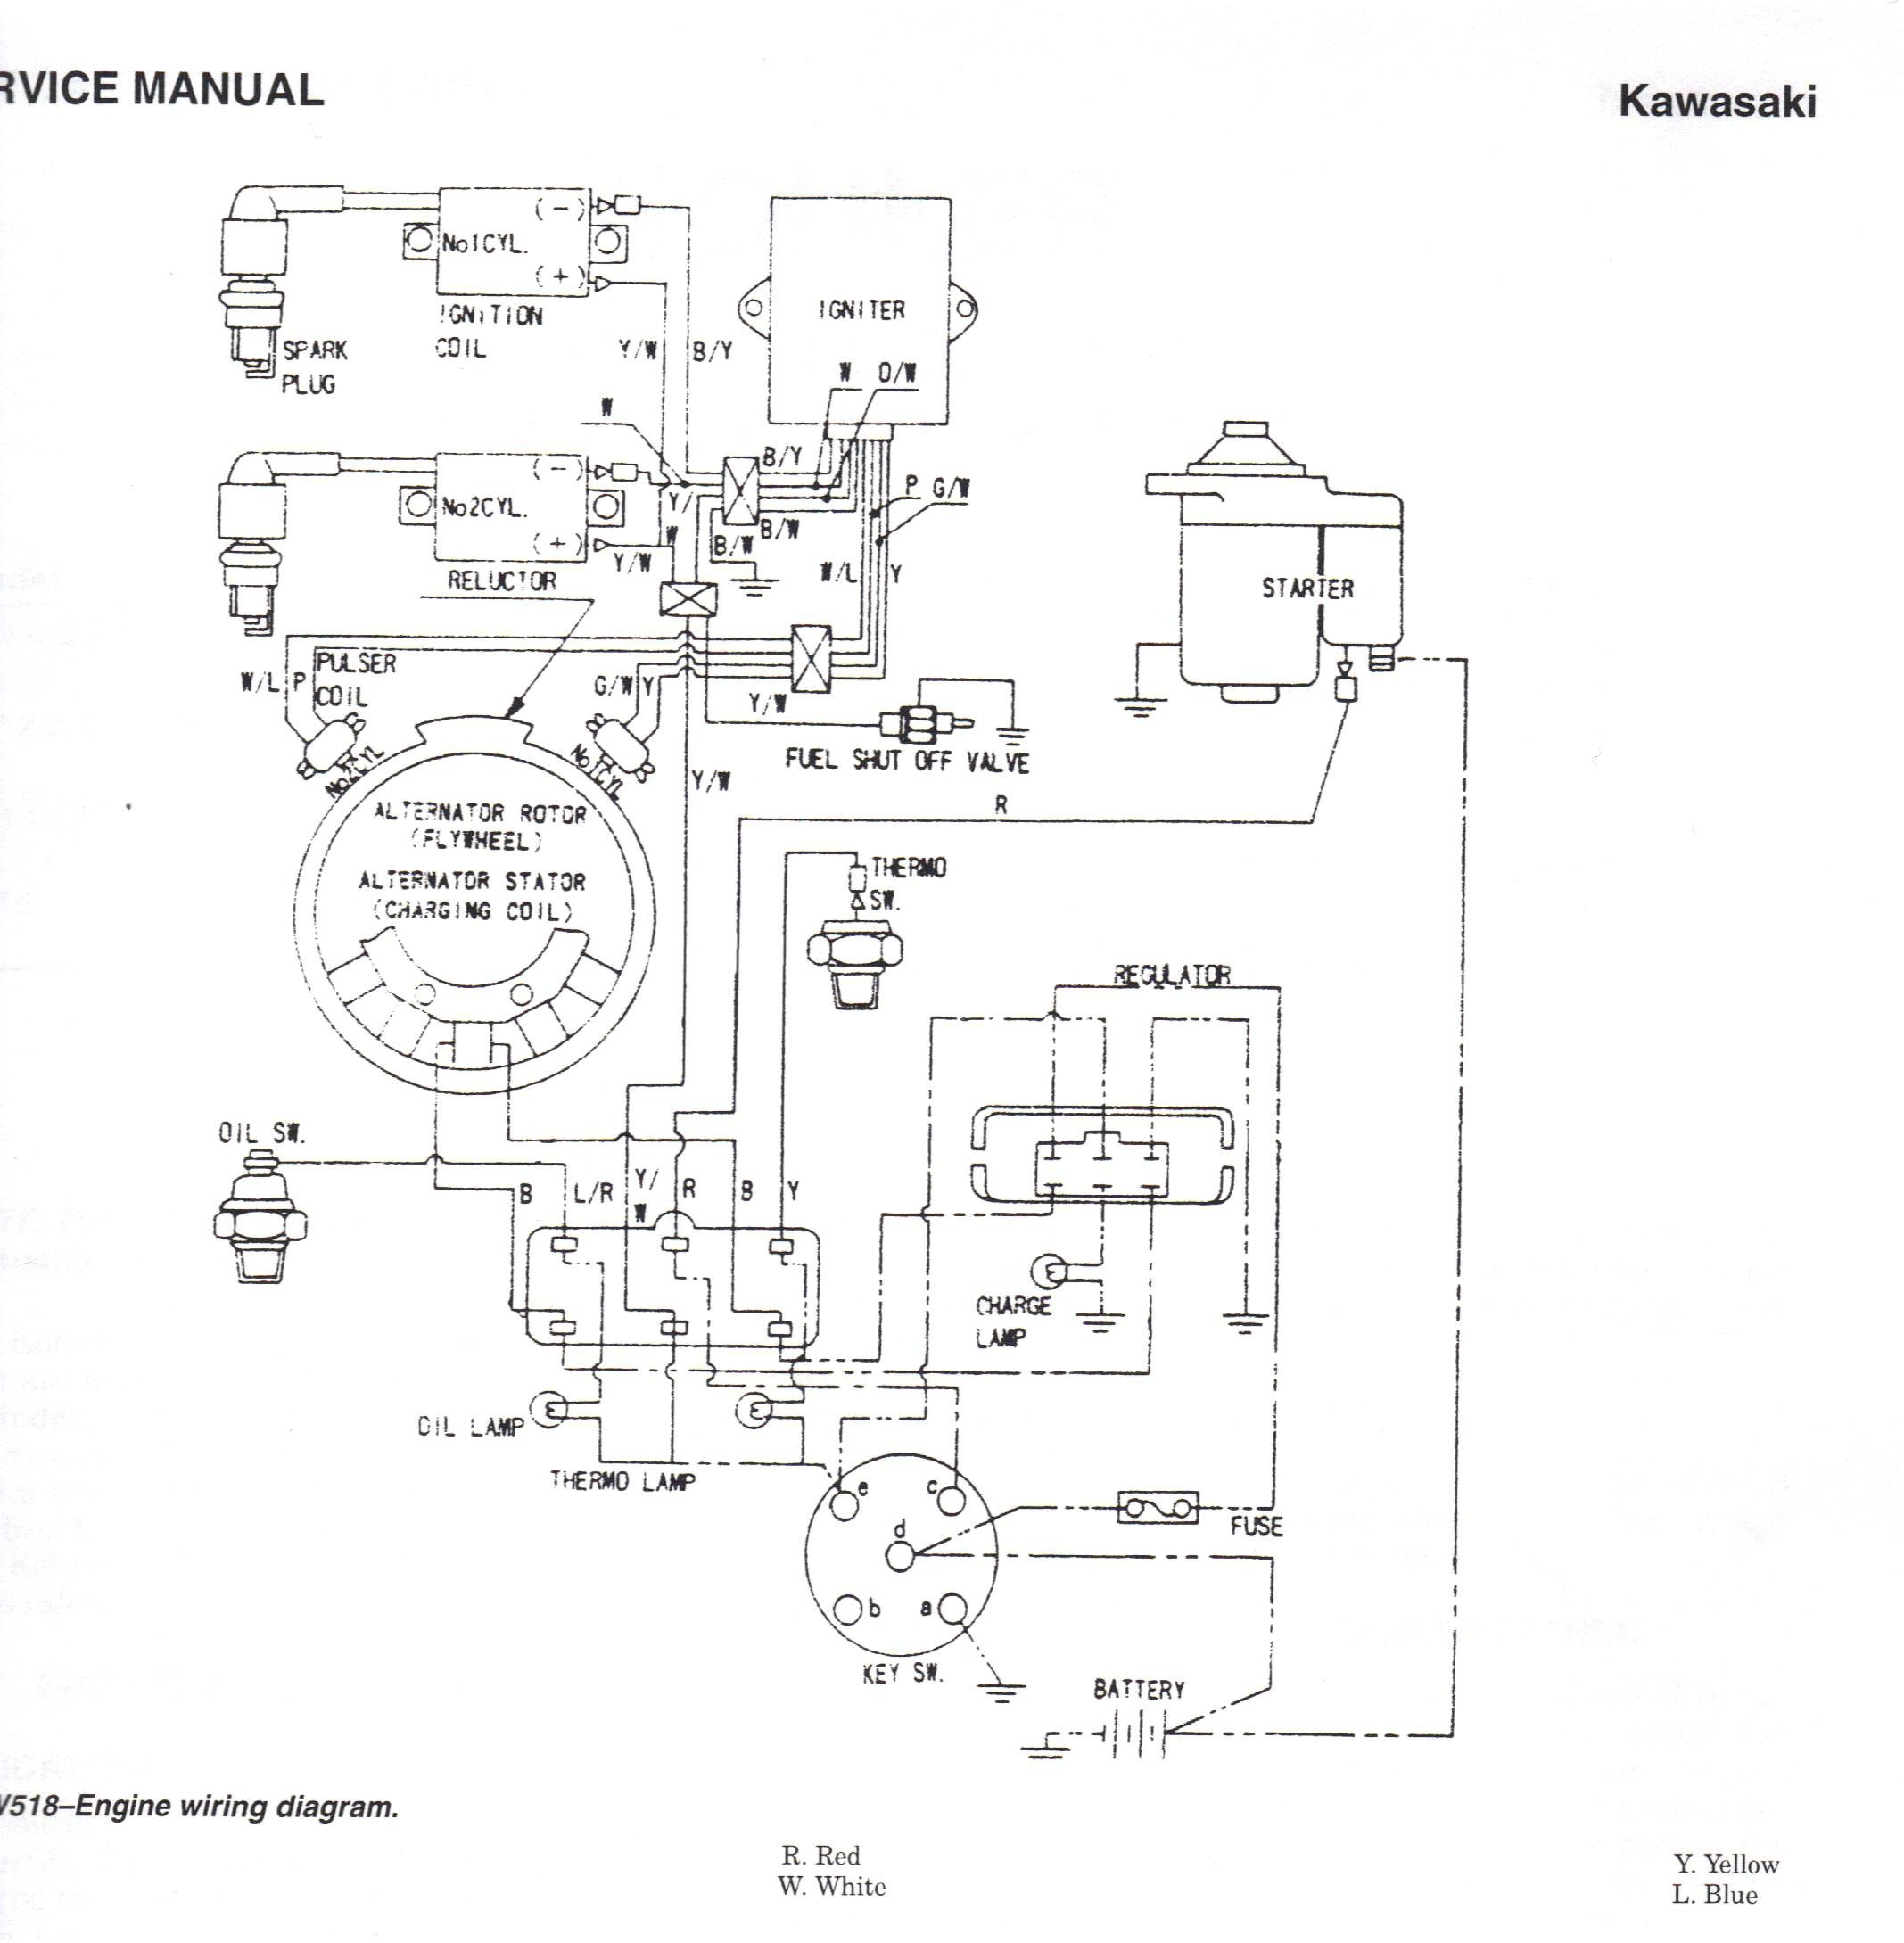 John Deere S82 Wiring Diagram